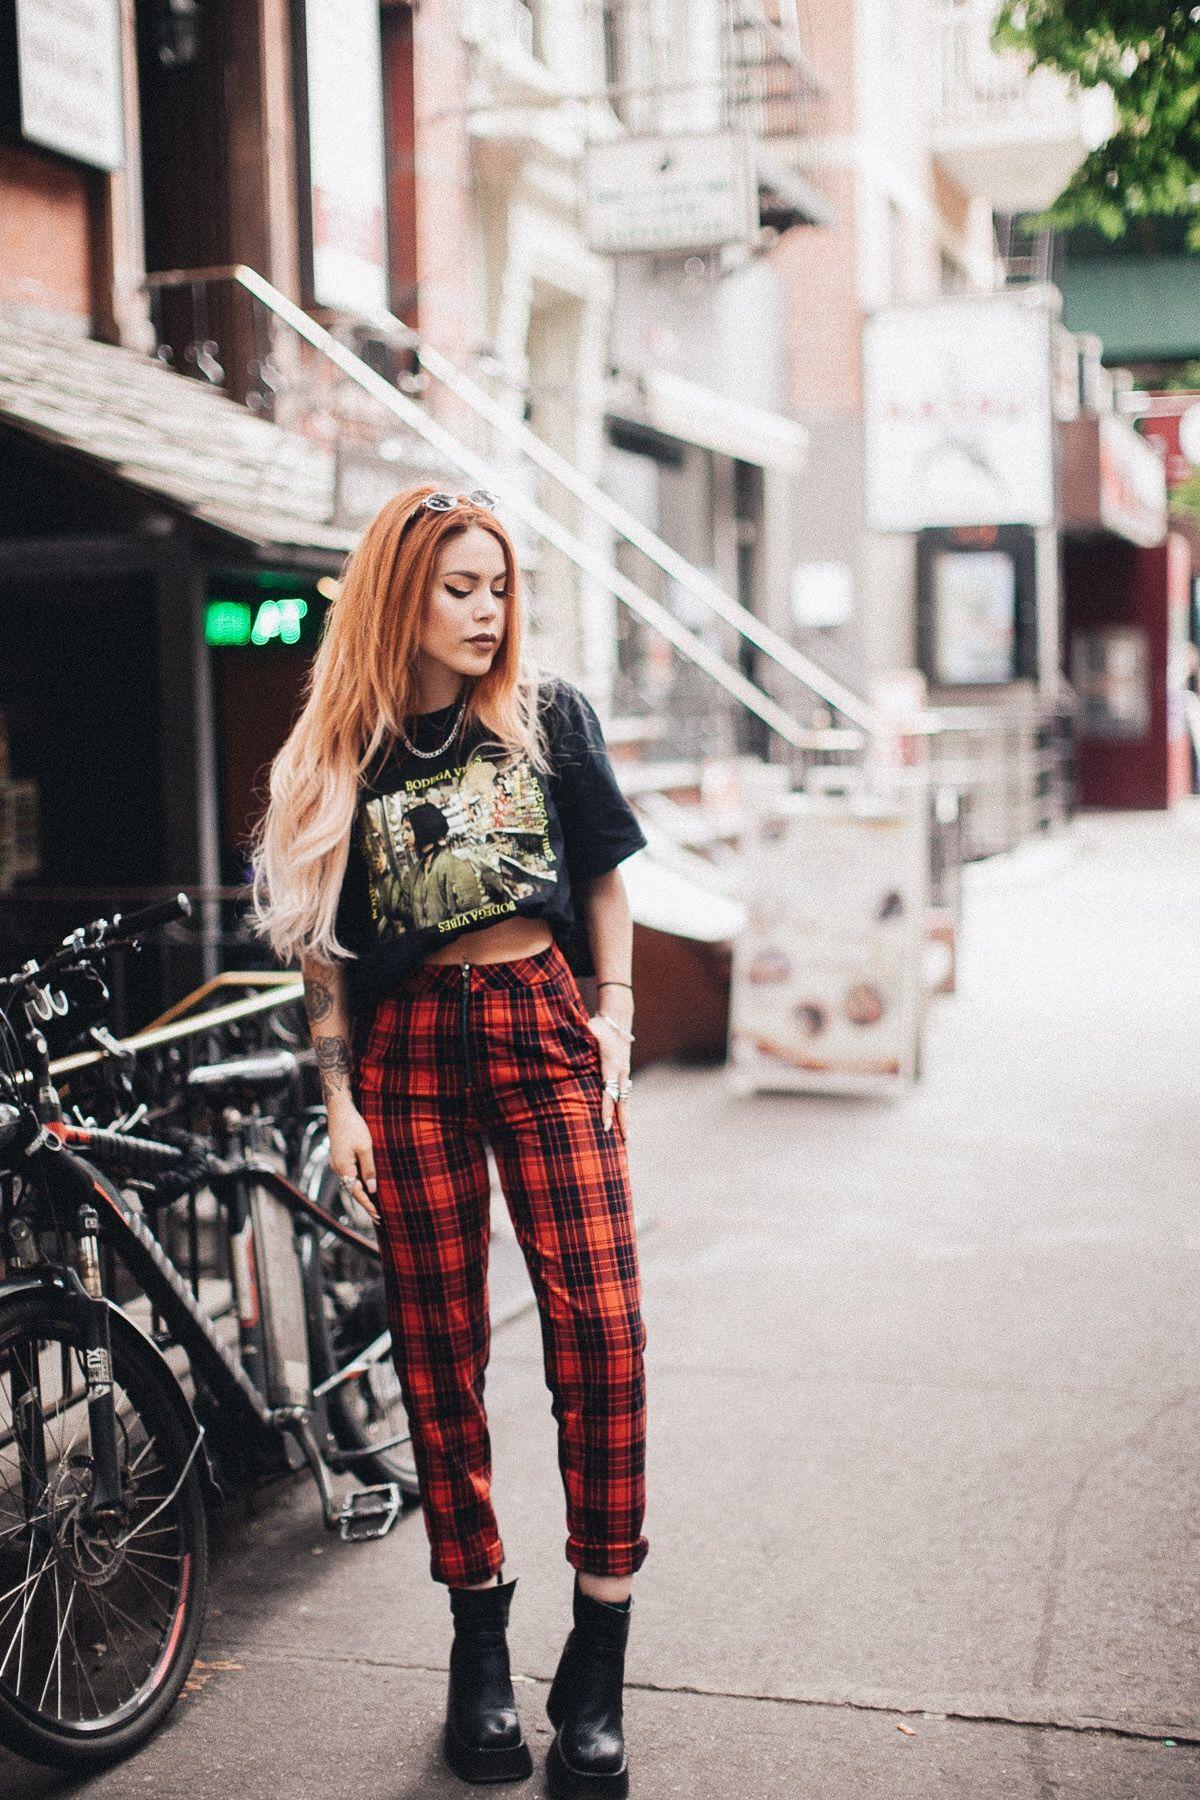 Bodega Vibes. - LE HAPPY : LE HAPPY   Grunge Fashion in ...